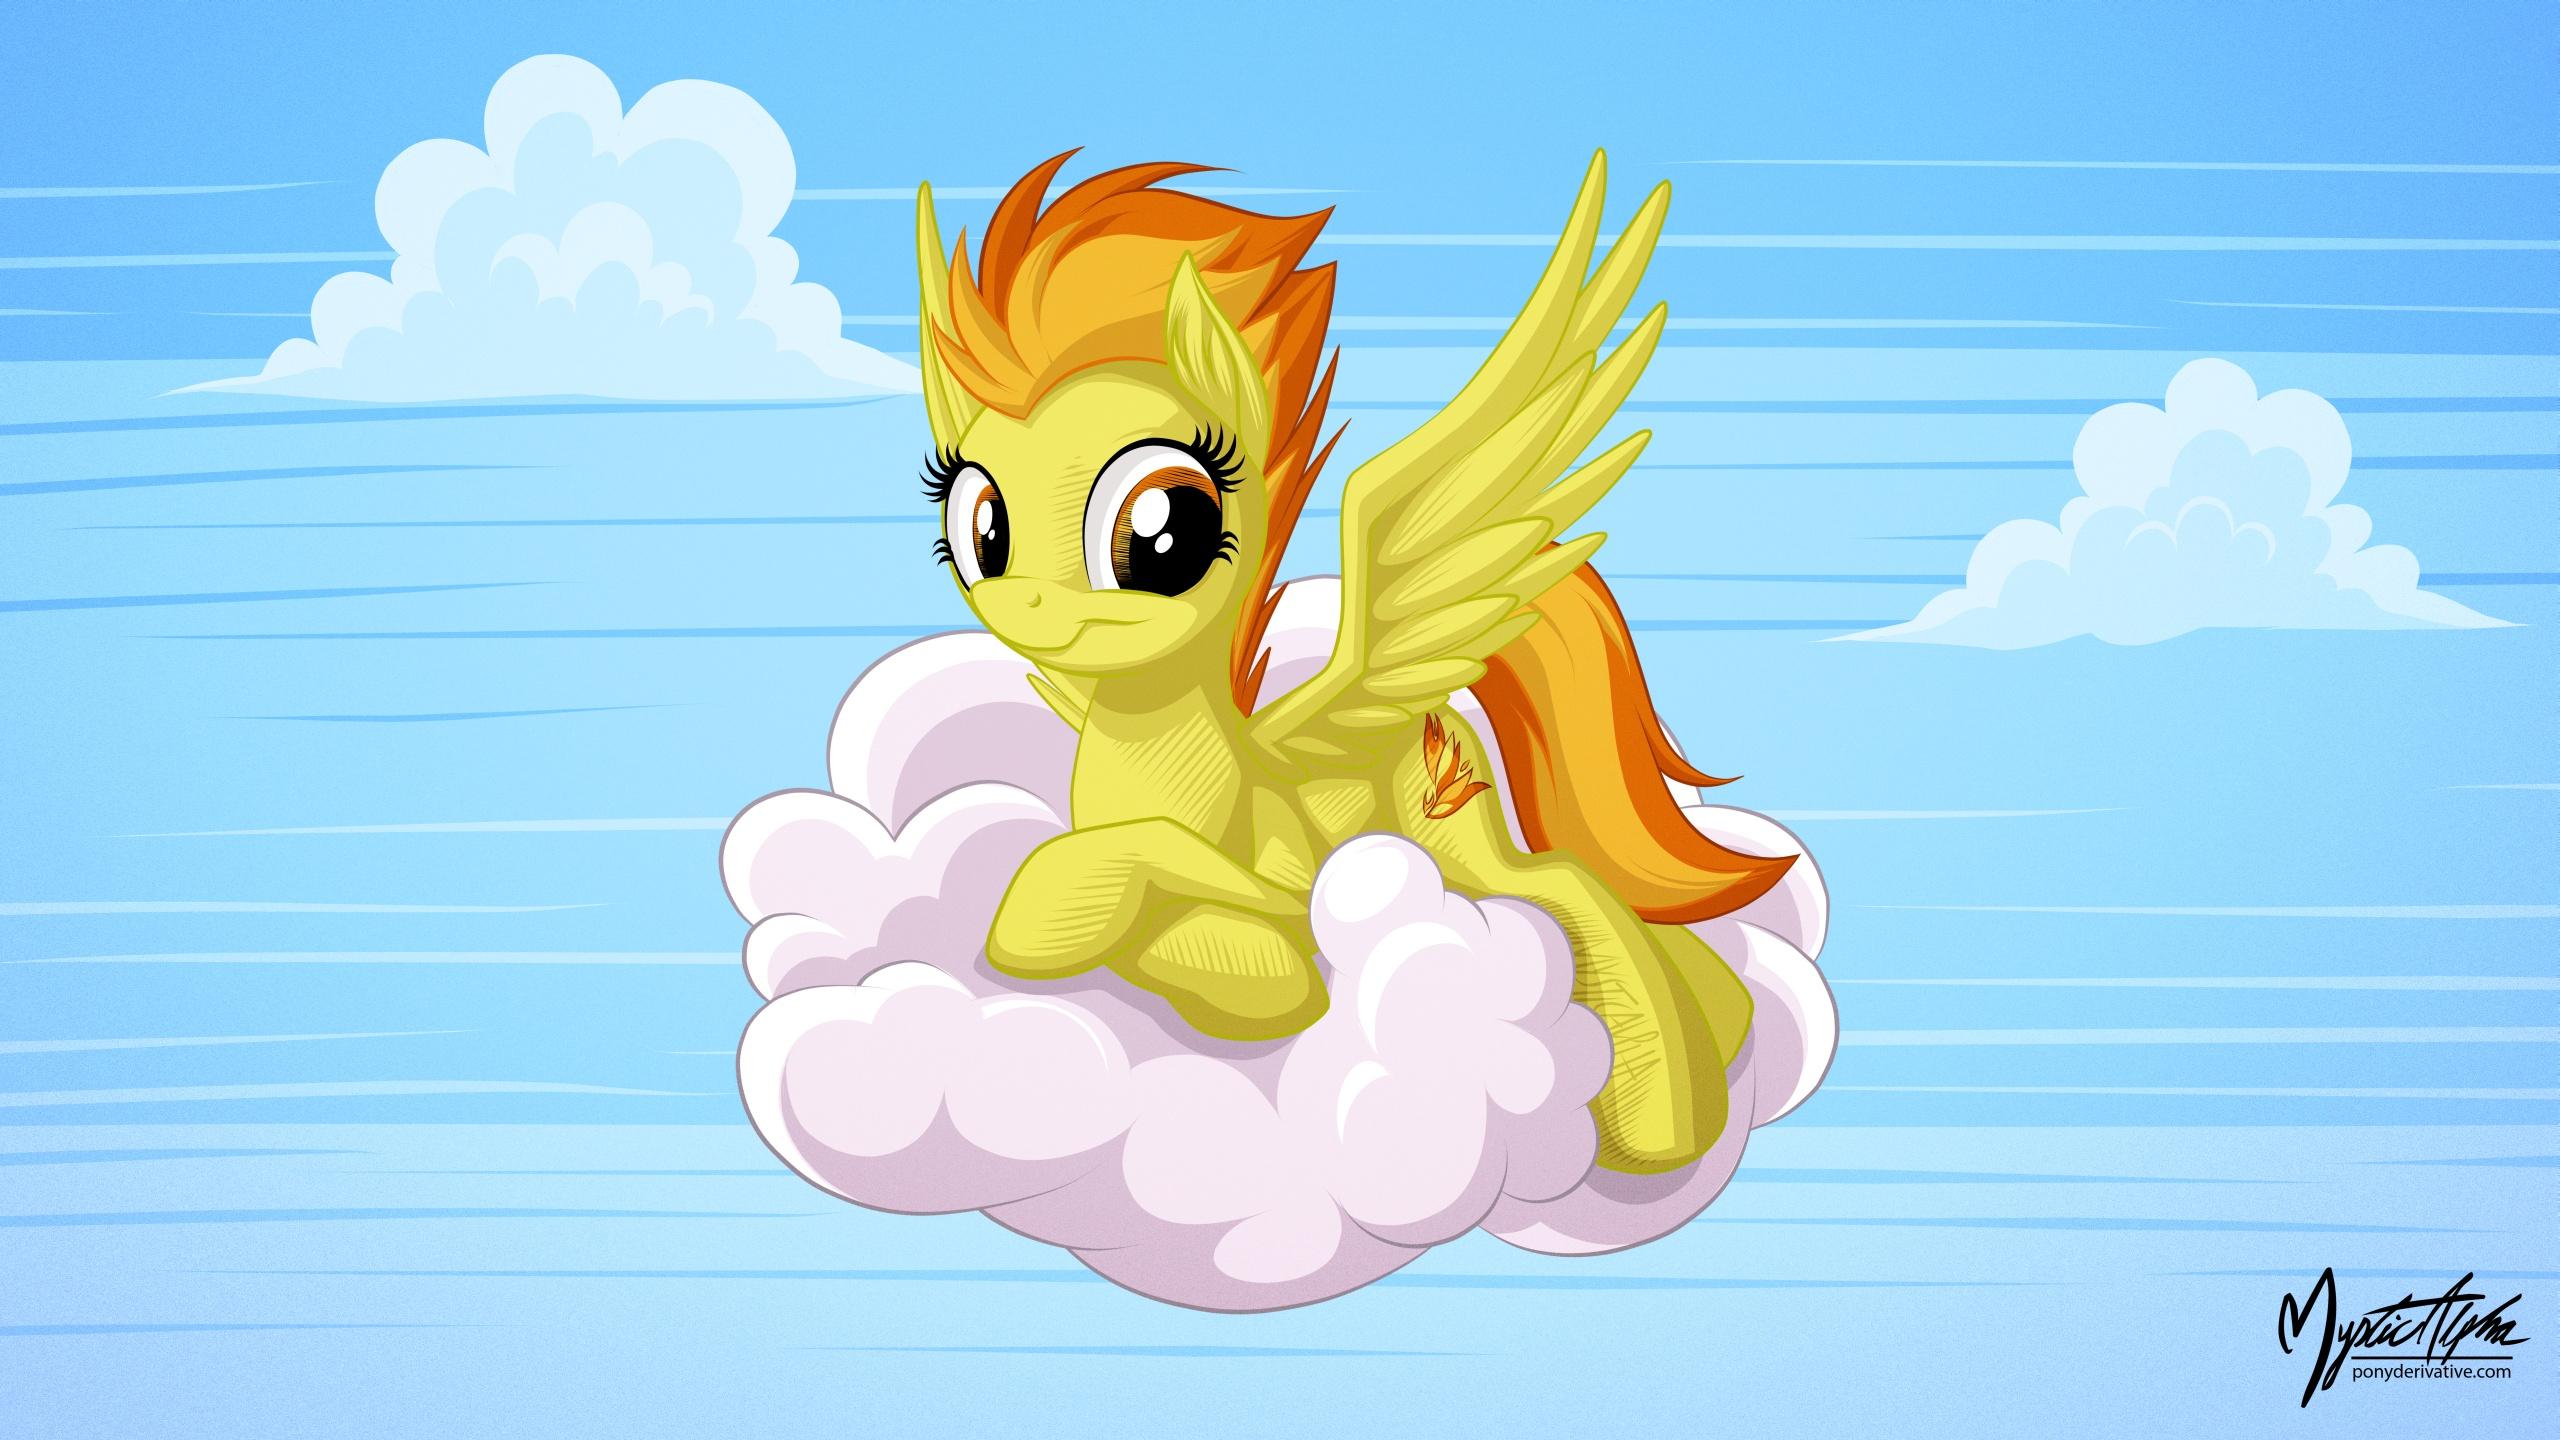 Spitfire on a Cloud 16:9 by mysticalpha